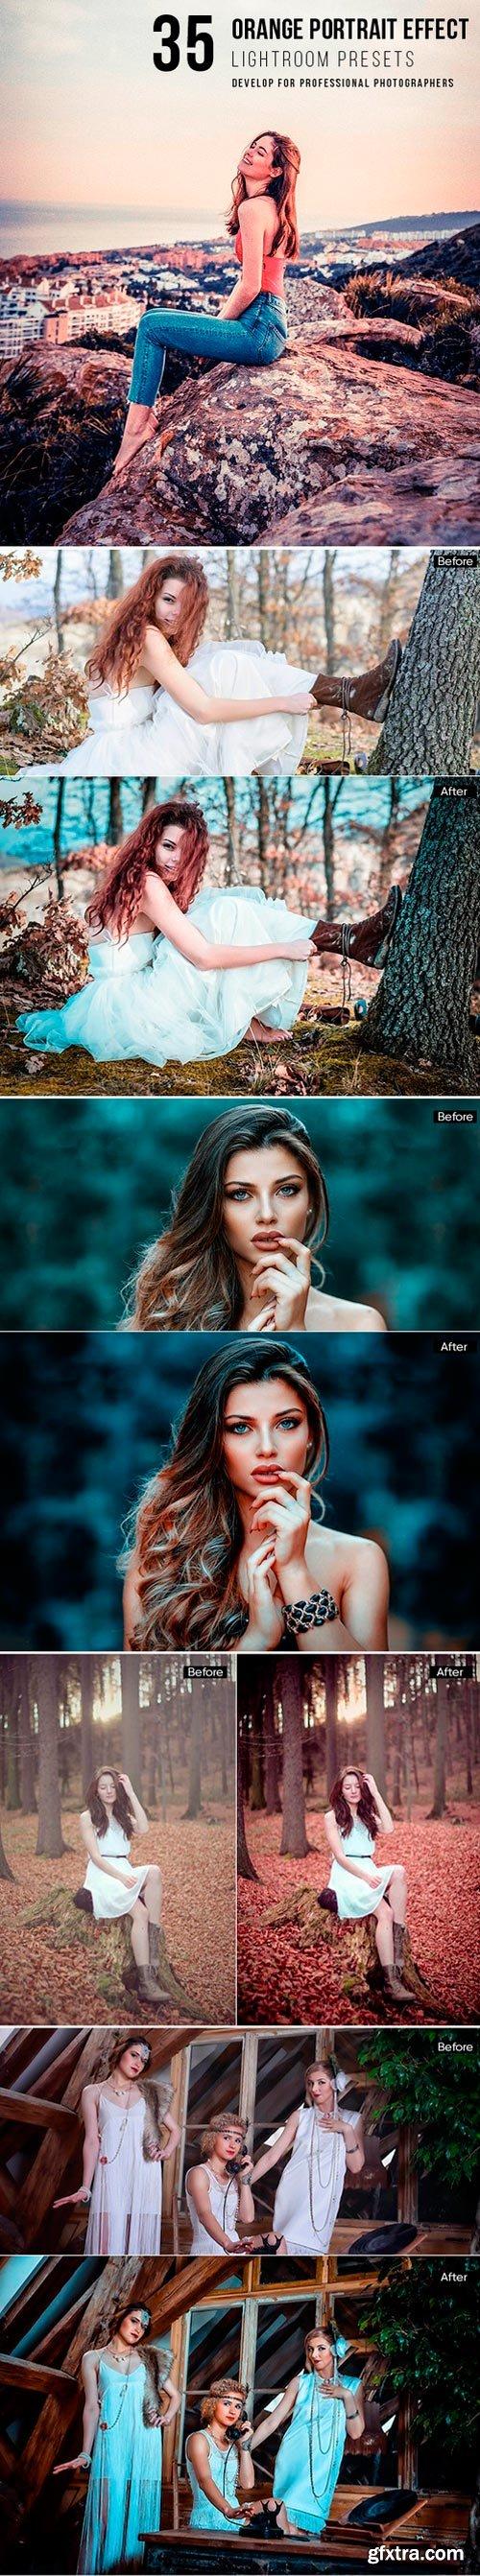 Graphicriver - 22141416 35 orange portrait effect presets